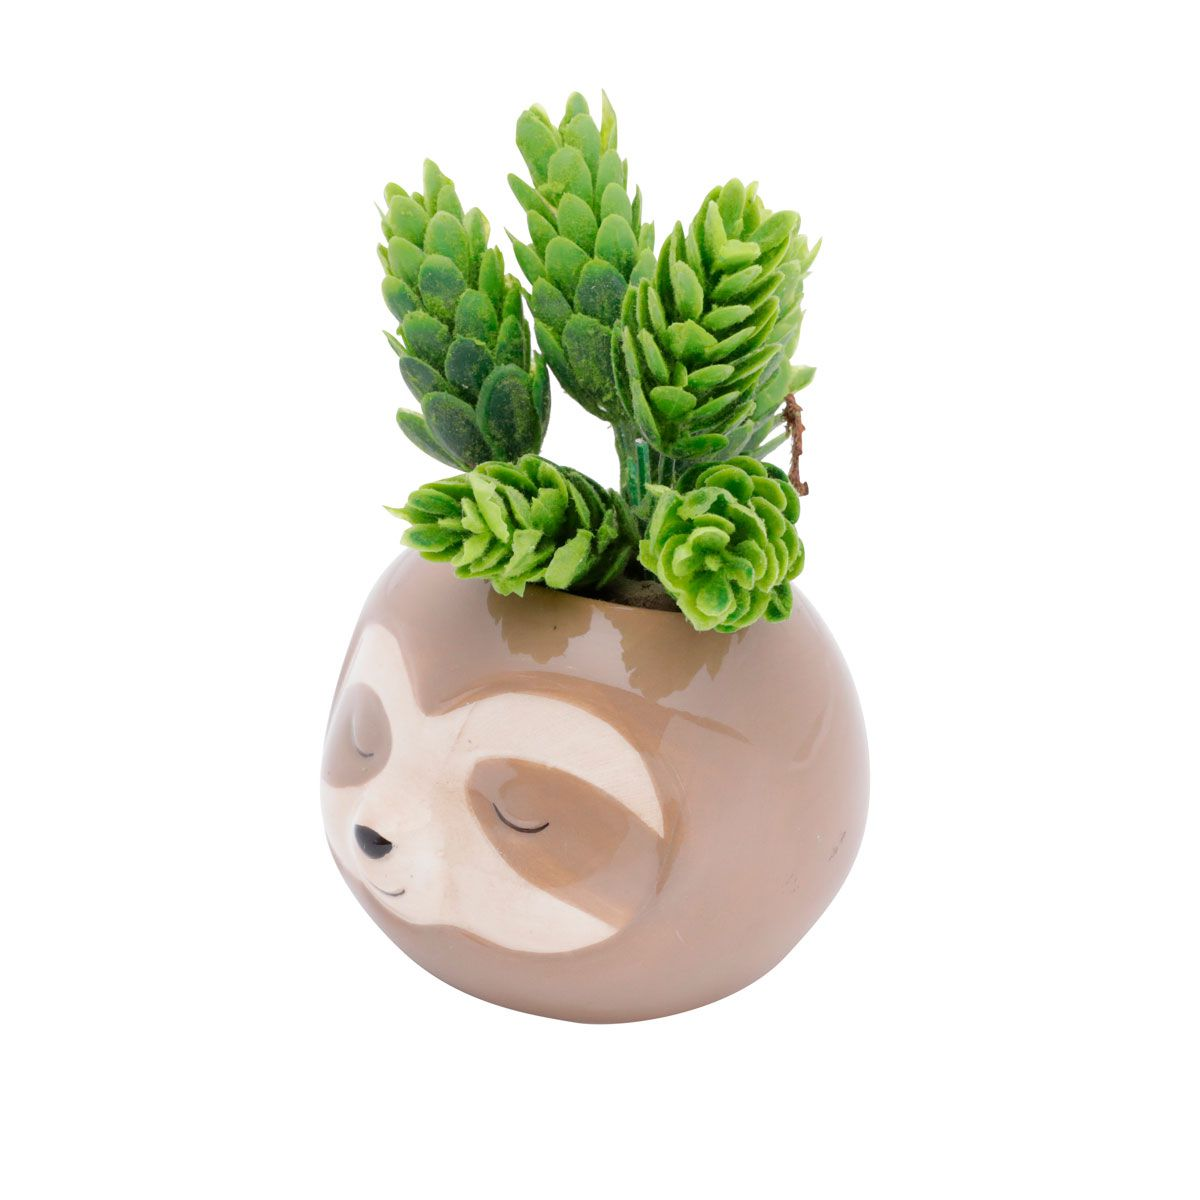 Kit 2 Cachepot Vaso Decorativo Bicho Preguiça E preguicinha Fofa